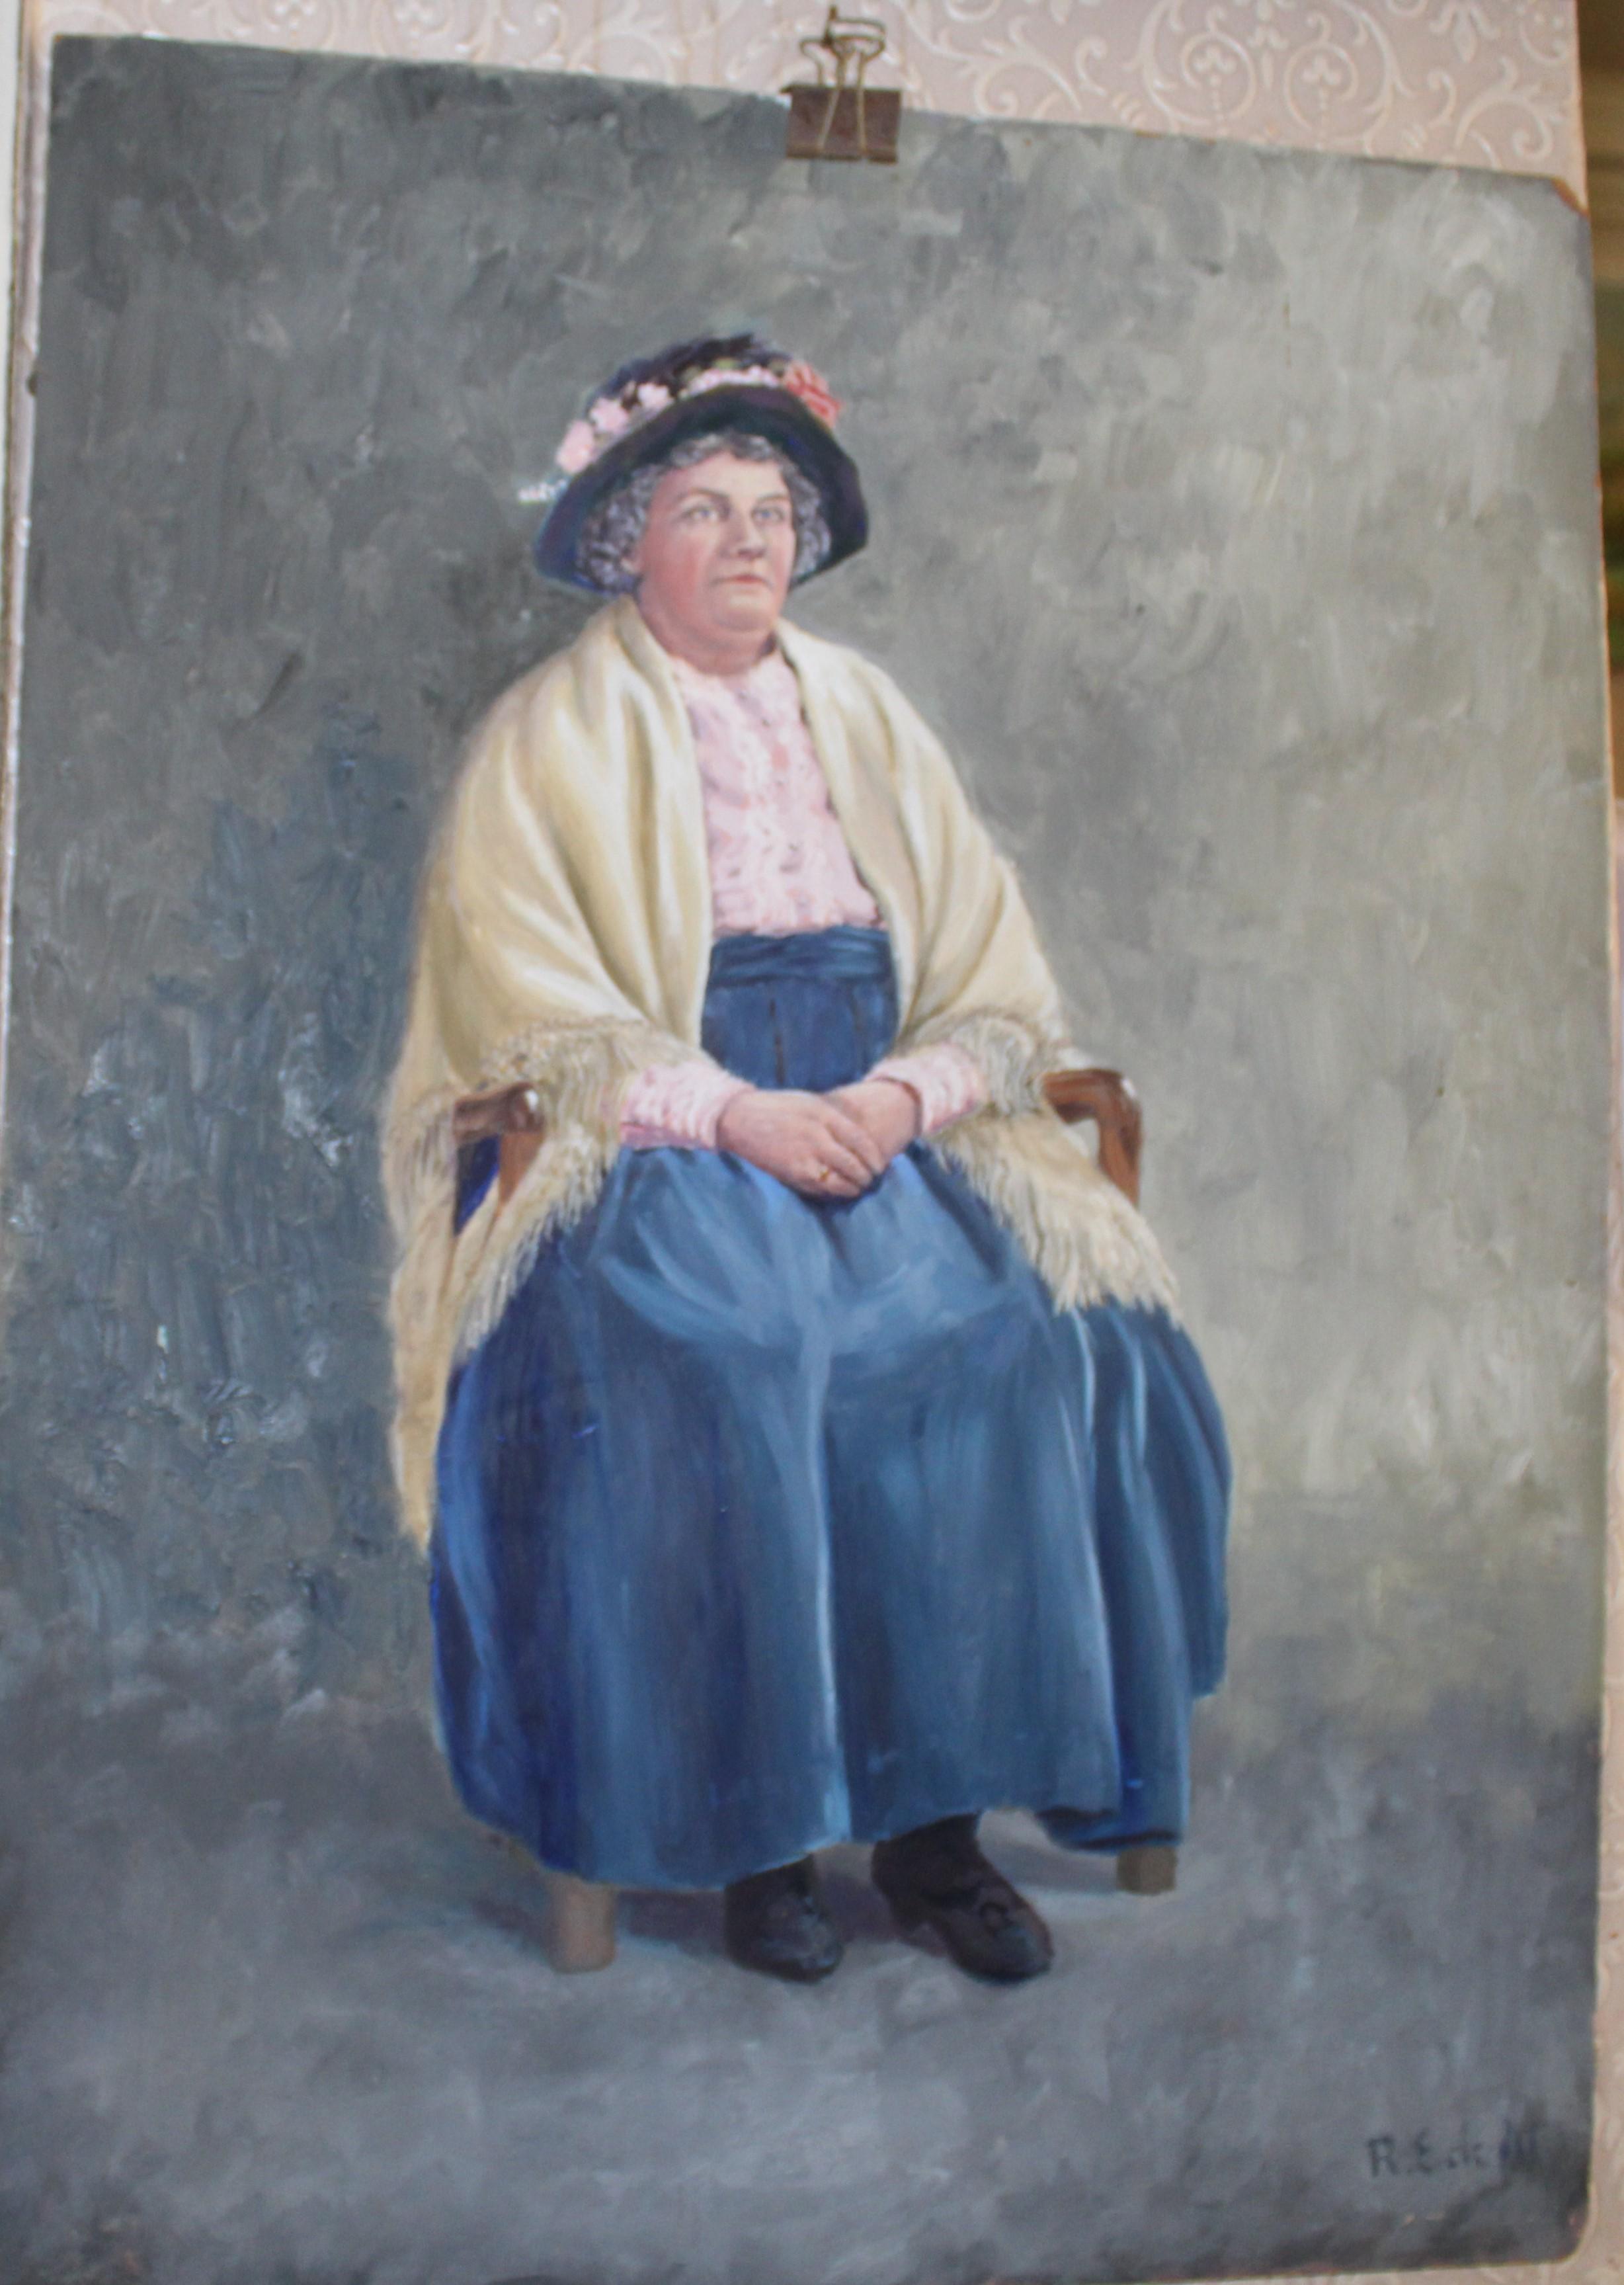 •COSTER WOMAN Signed unframed oil on board, 60 x 44.5cm, titled on International Amateur Art